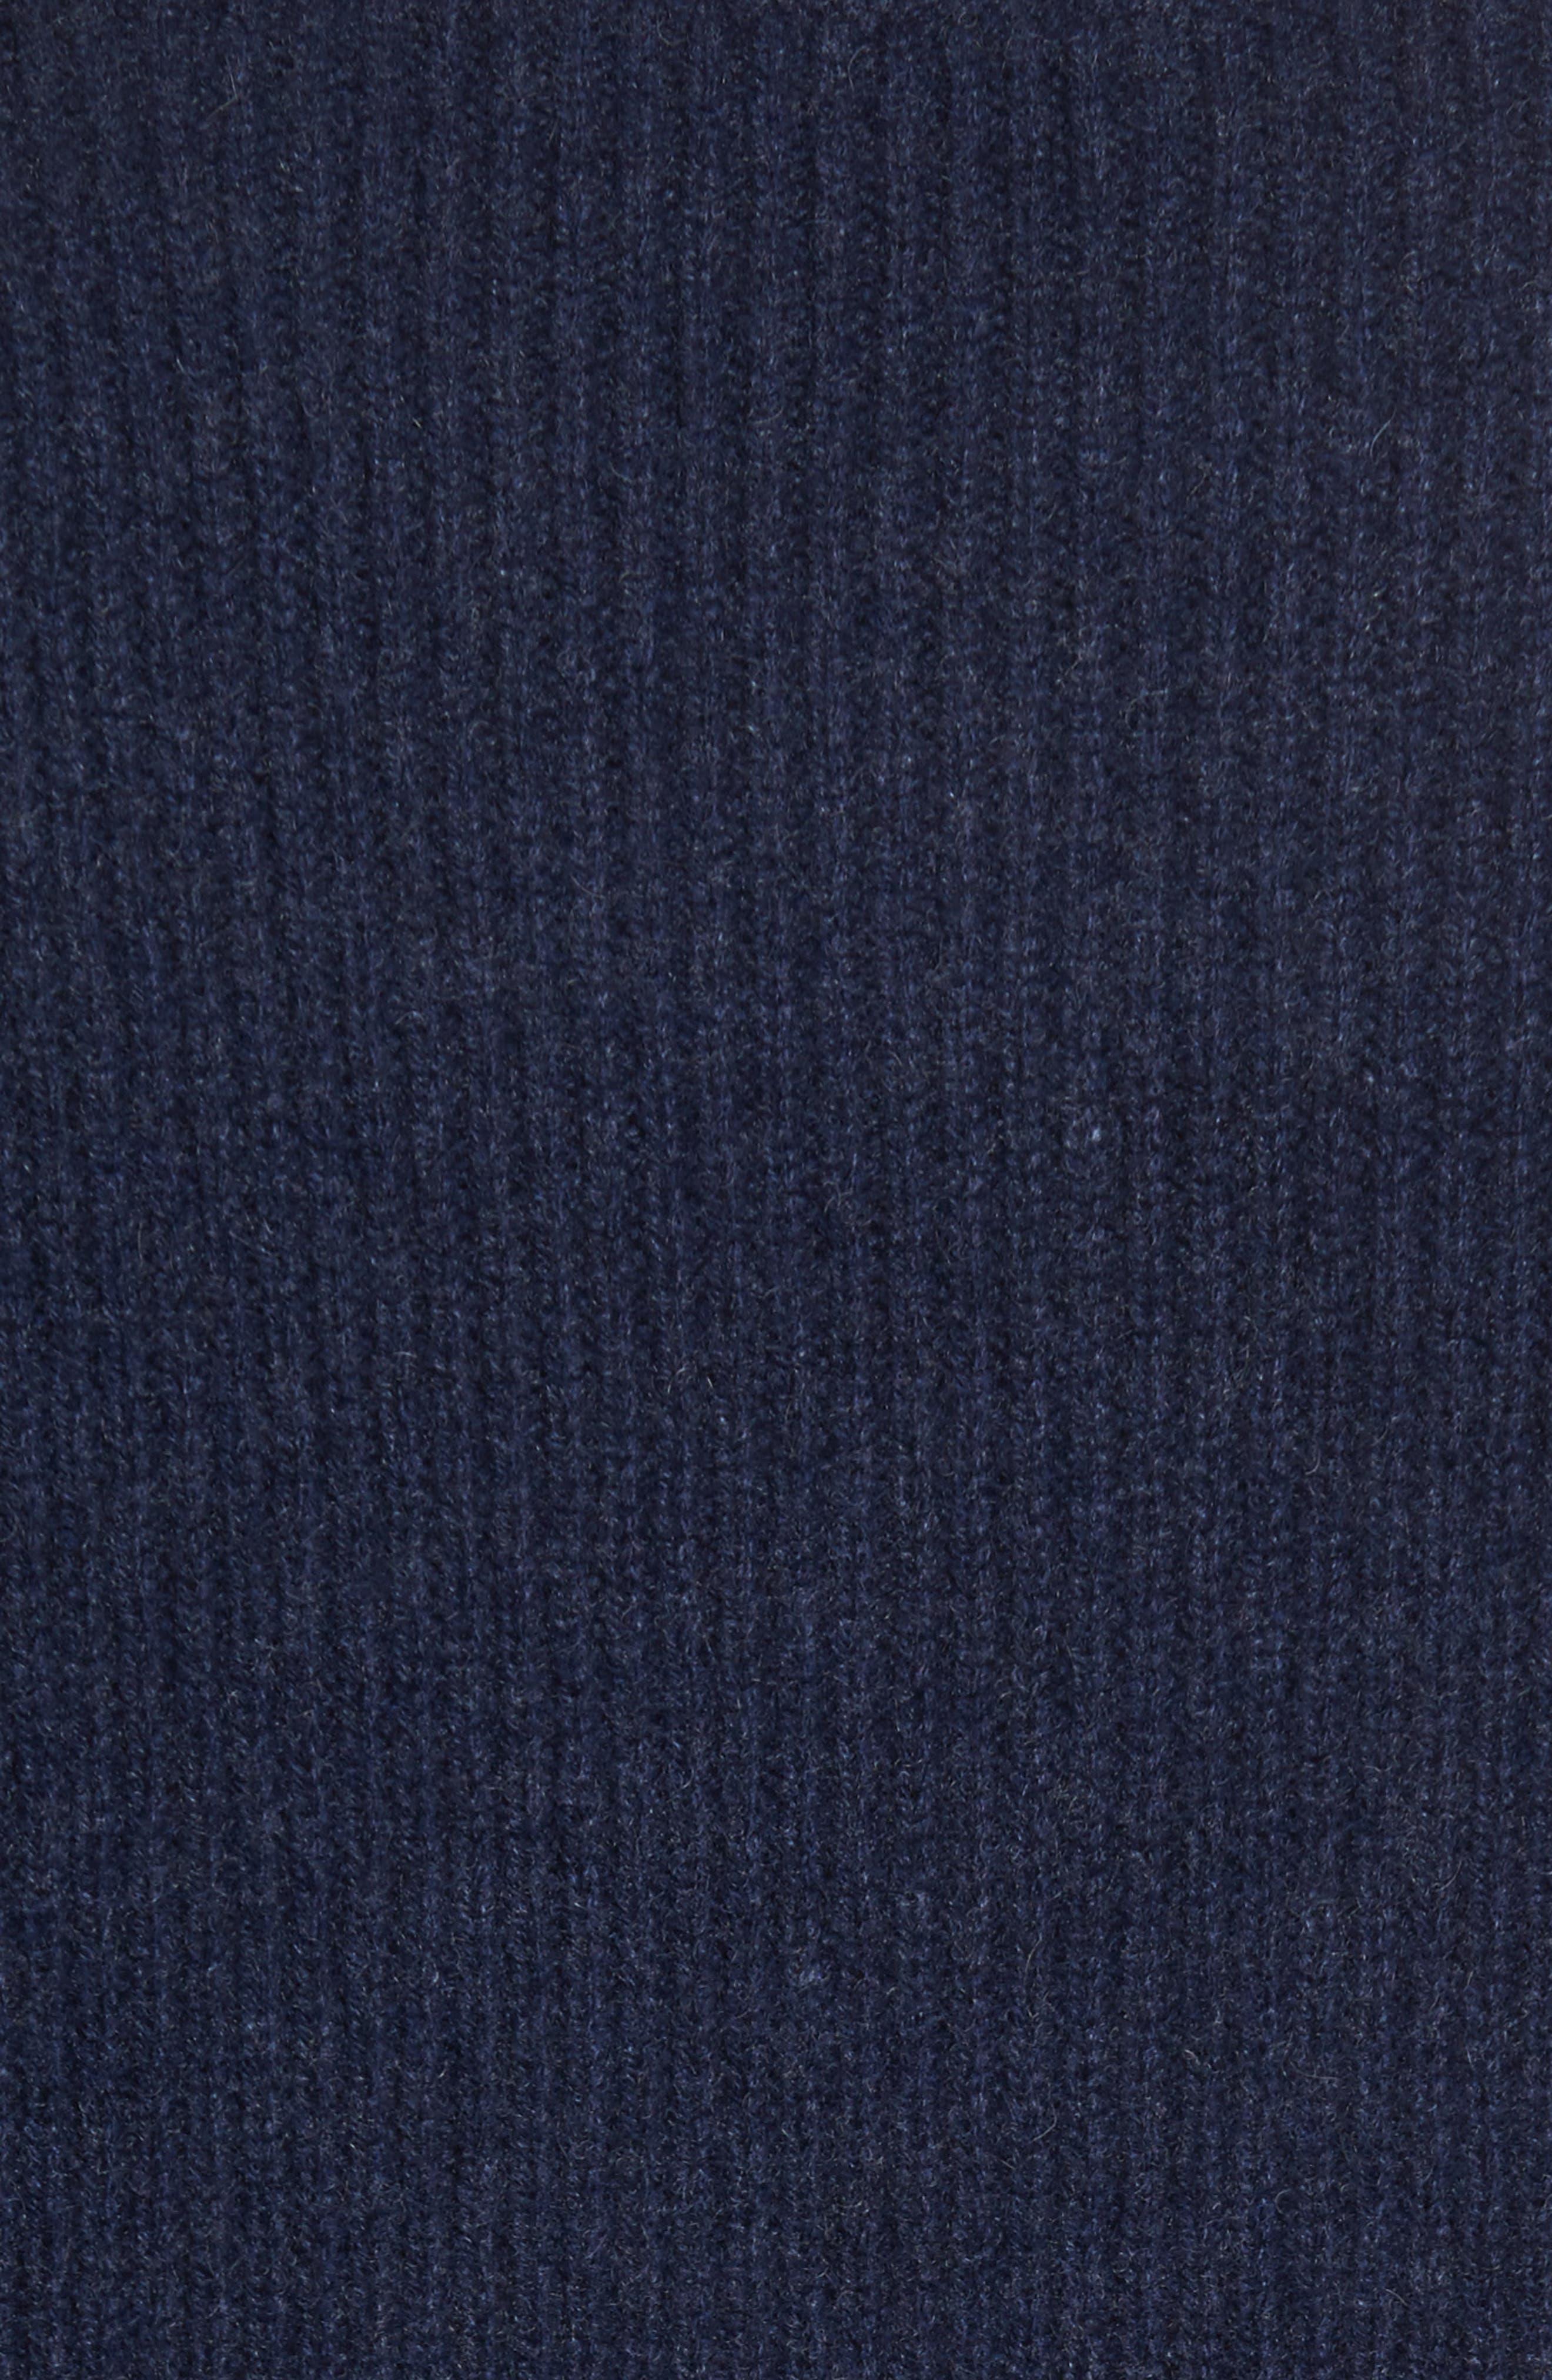 Ribbed Wool & Cashmere Raglan Sweater,                             Alternate thumbnail 6, color,                             Coastal